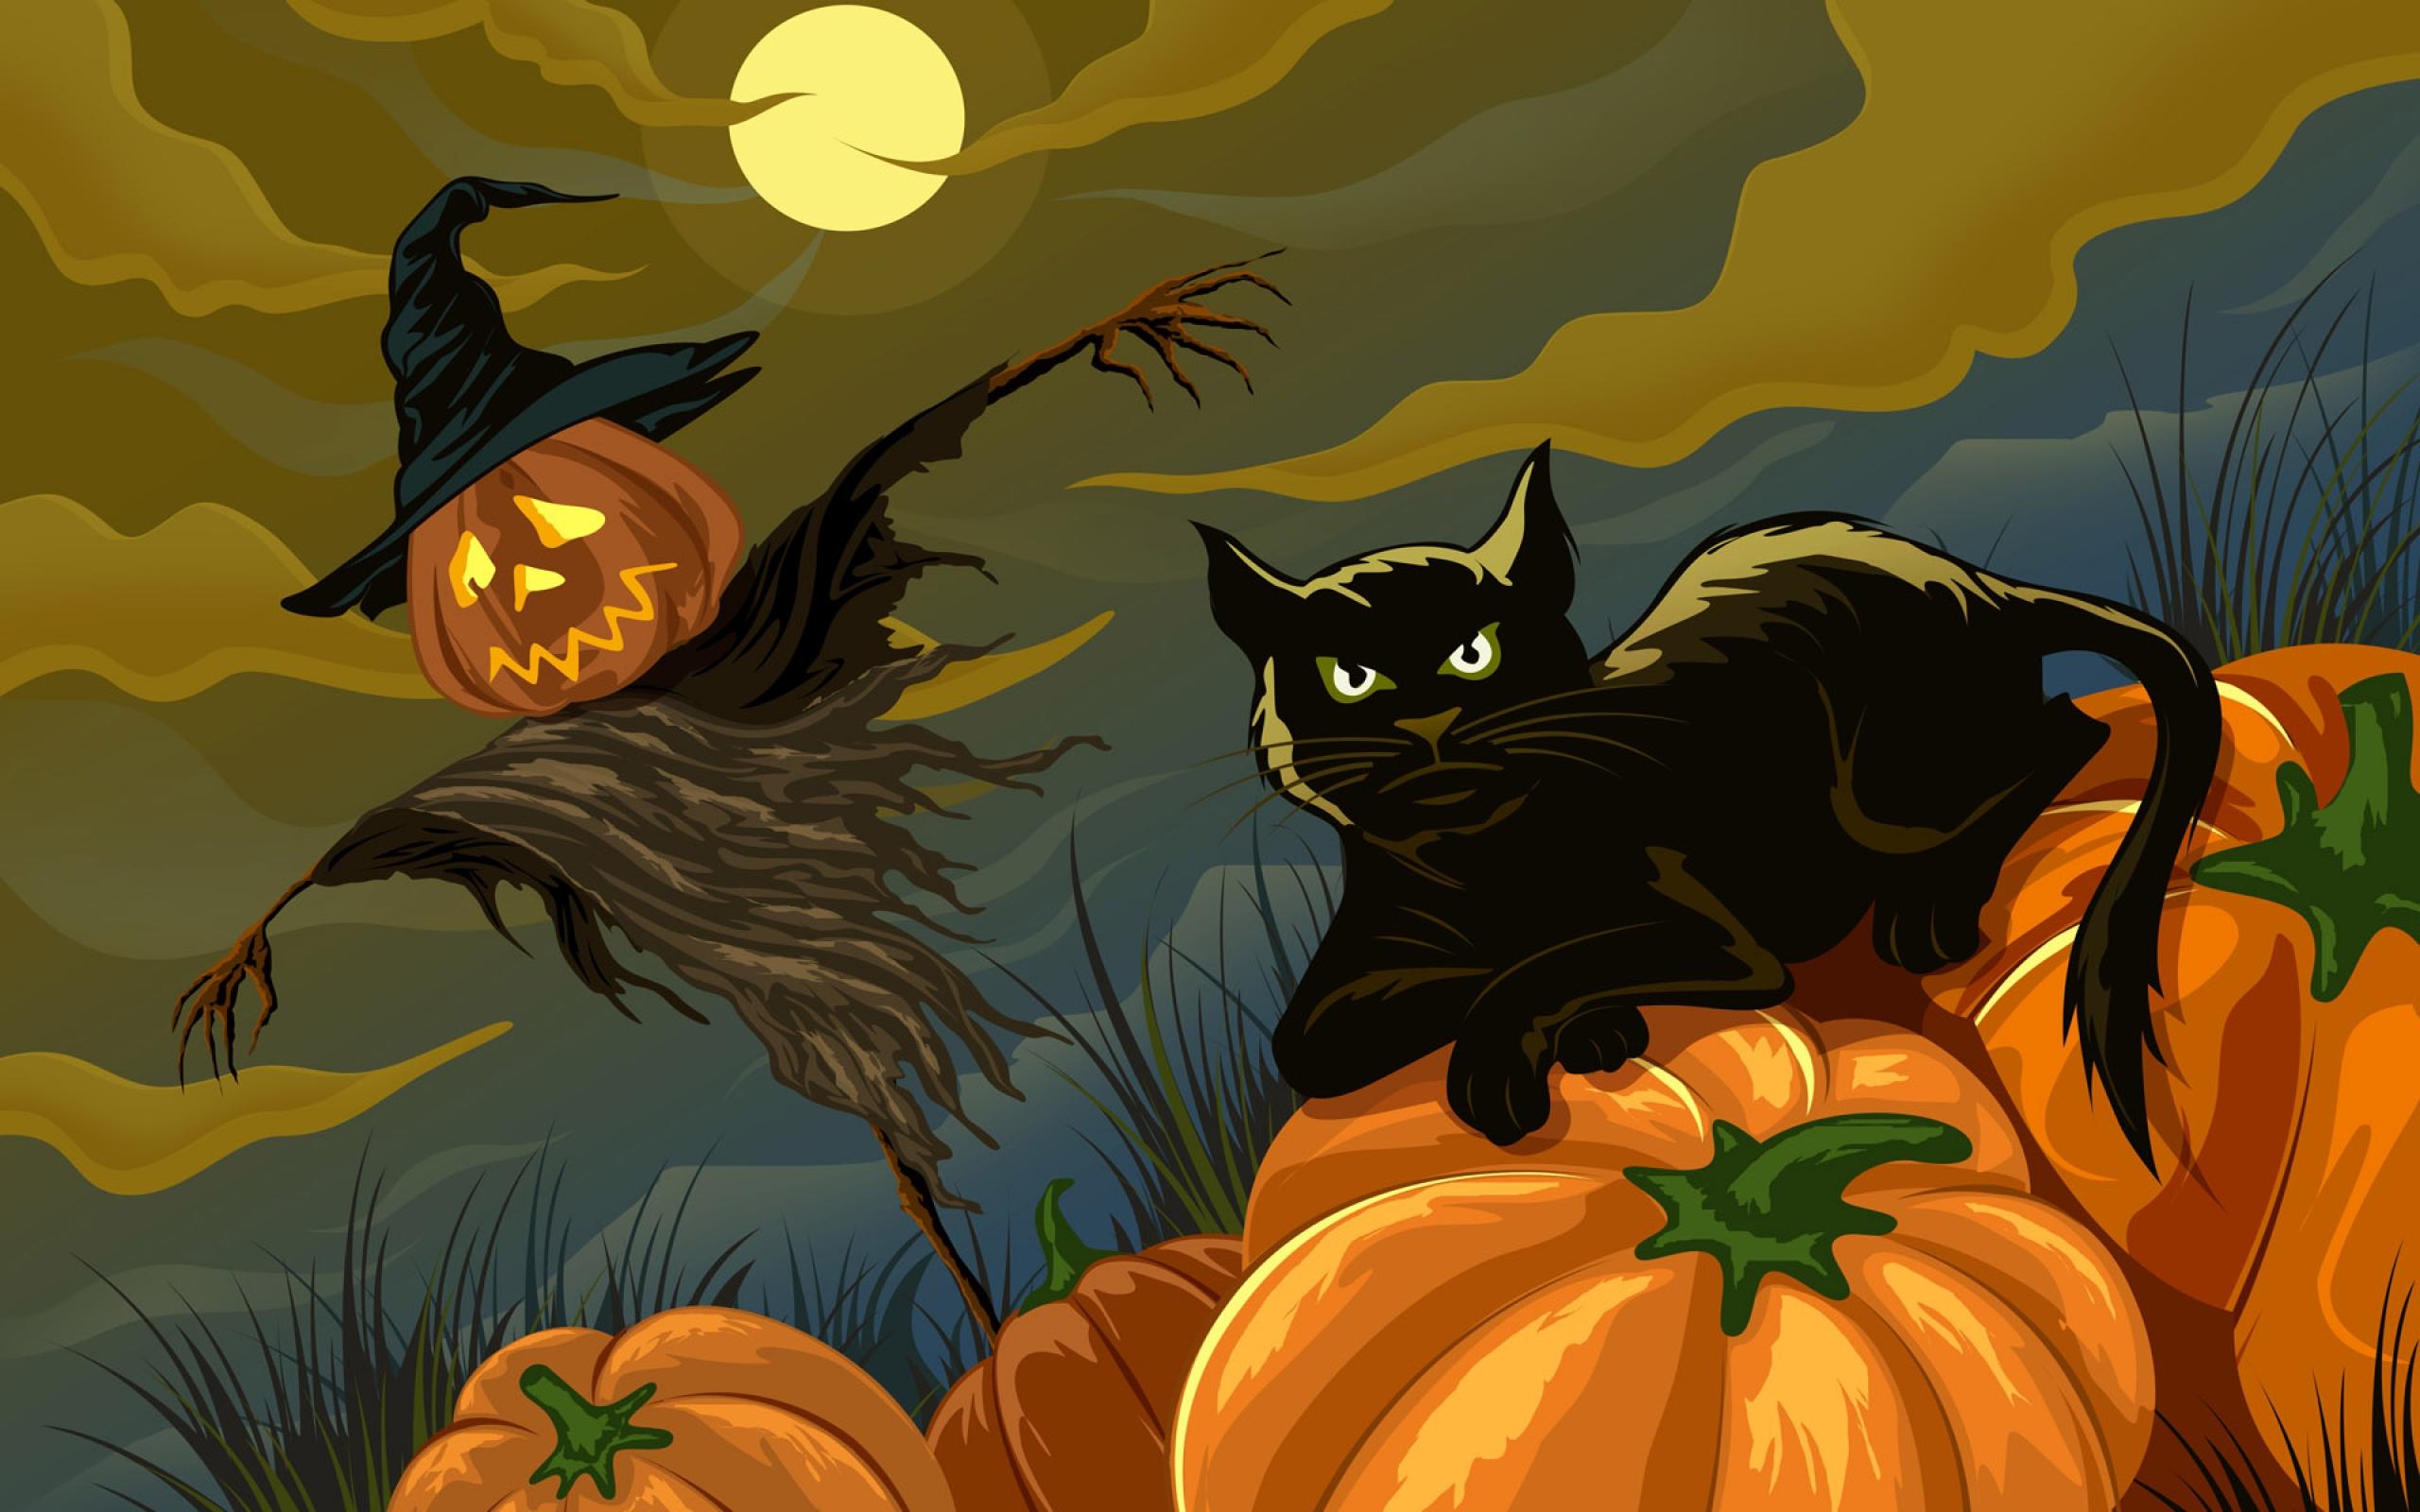 25 Cool Halloween Wallpaper Images 2020 2560x1600